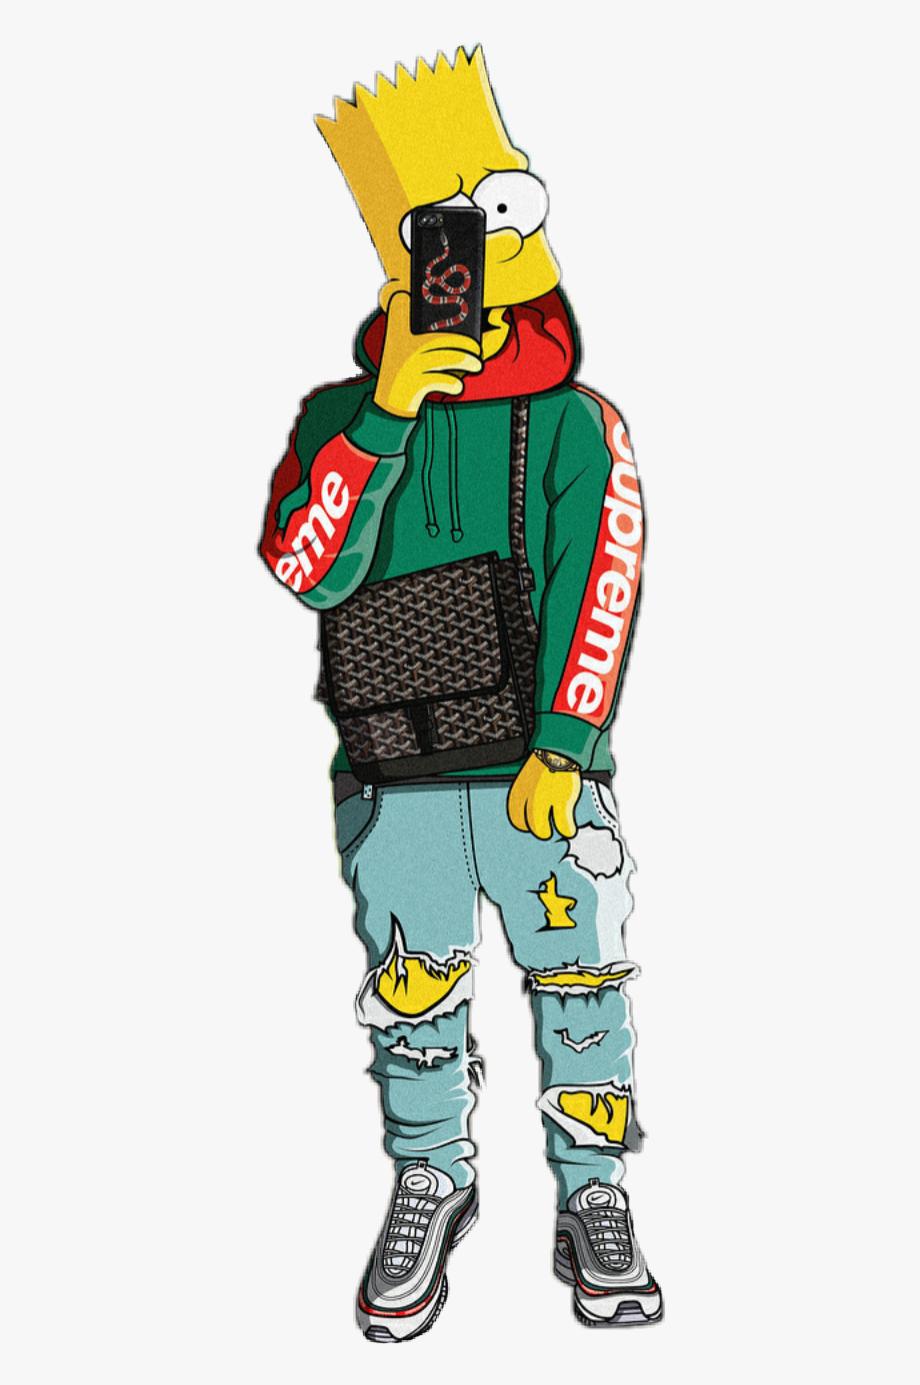 Download And Share Bart Simpson Bape Money Trap Rich Yeezy Bape Bart Simpson Supreme Cartoon Seach Mor Bart Simpson Art Bart Simpson Bart Simpson Drawing